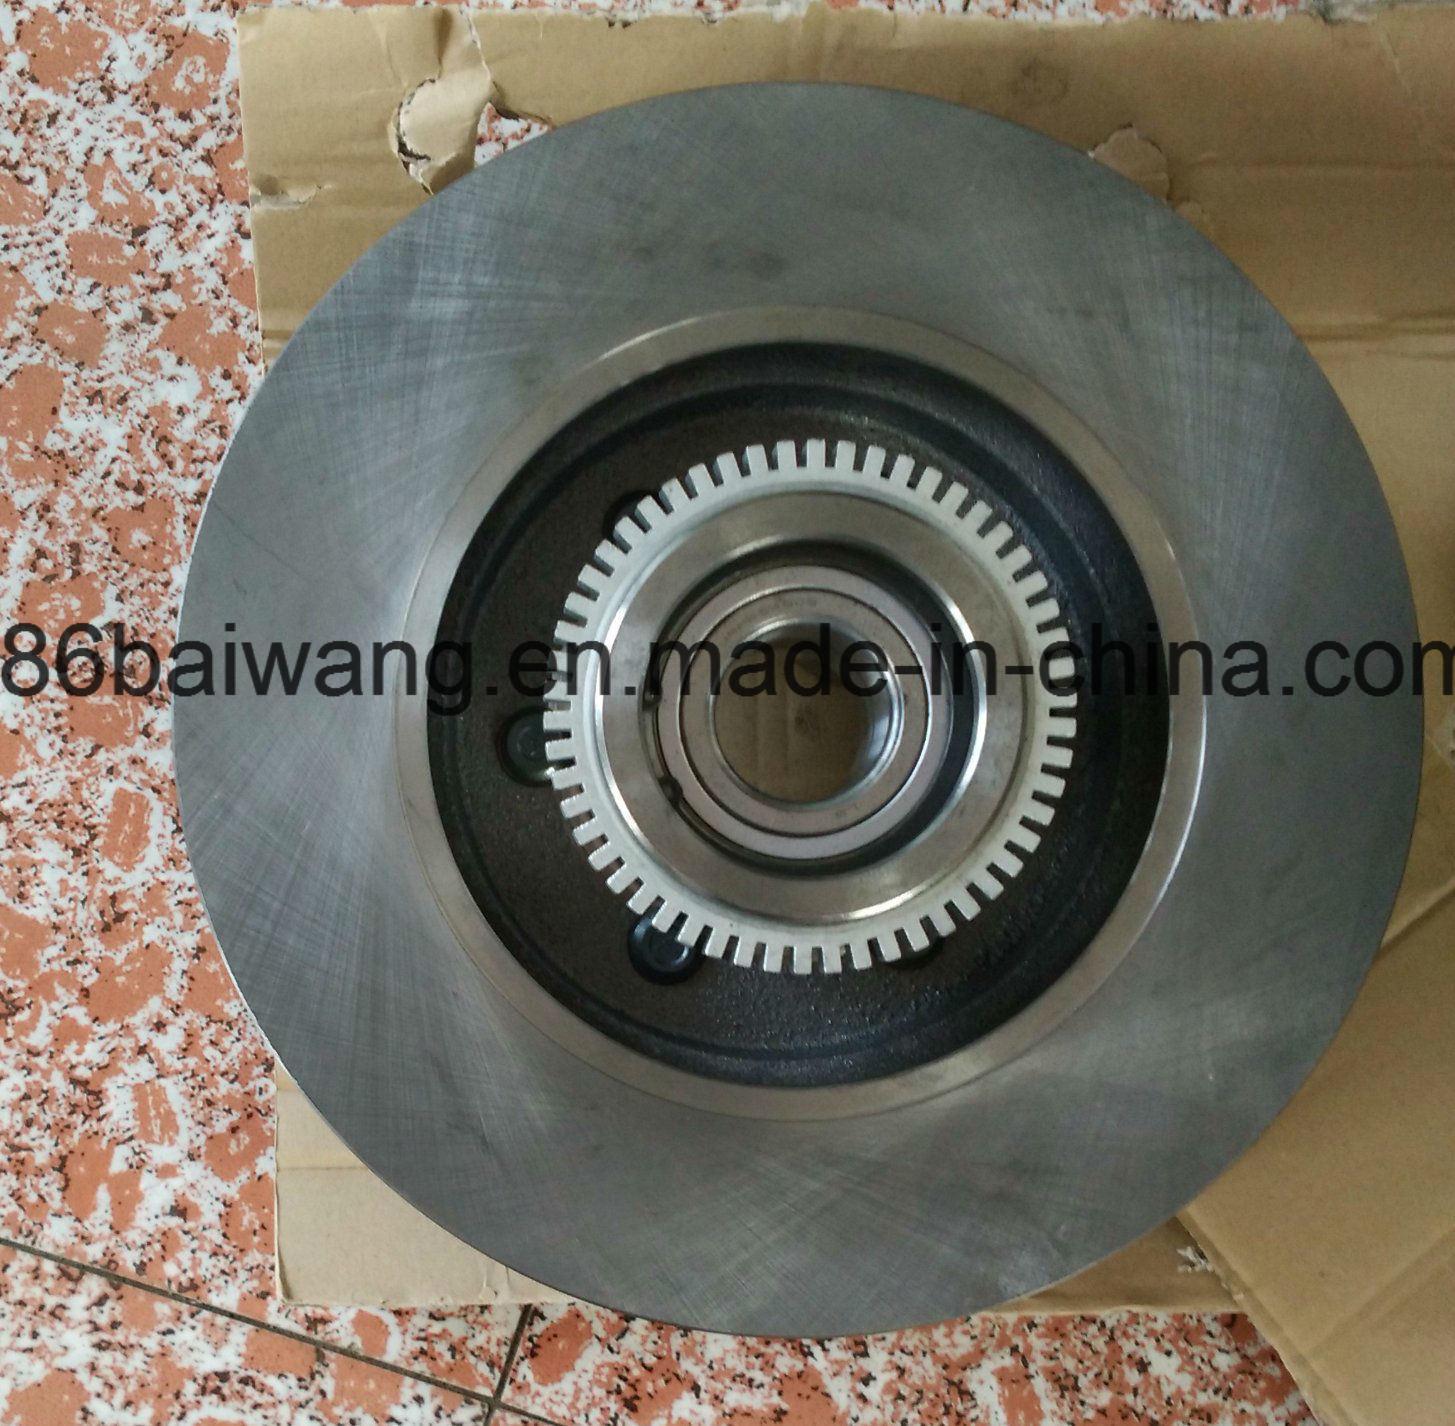 Brake Rotor 54076 for Ford Car Series